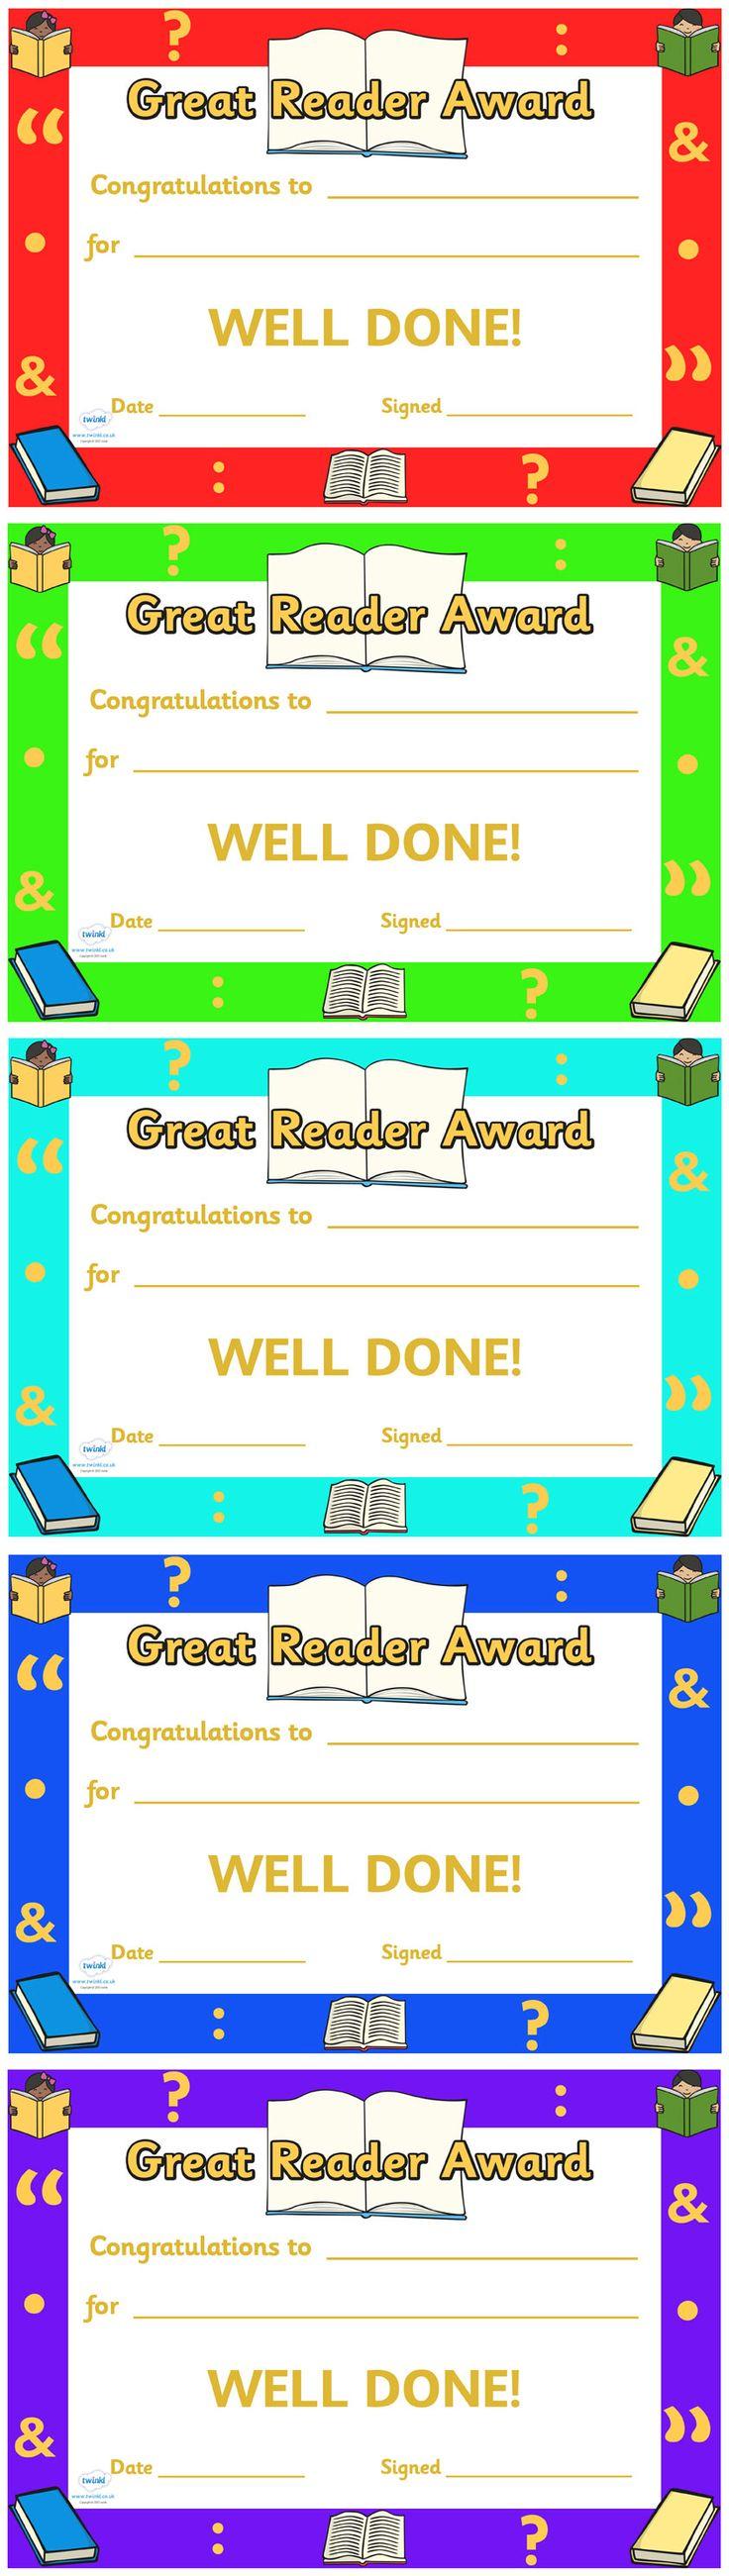 twinkl resources  u0026gt  u0026gt  great reader award certificate